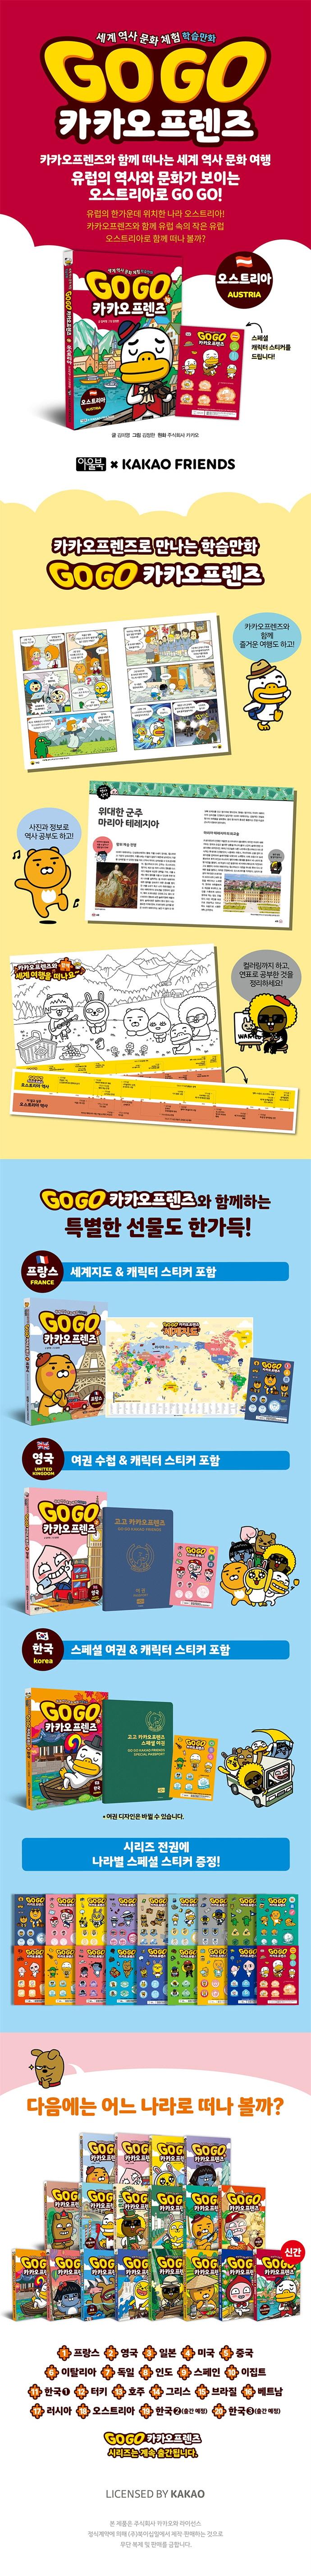 Go Go 카카오프렌즈. 18: 오스트리아 도서 상세이미지